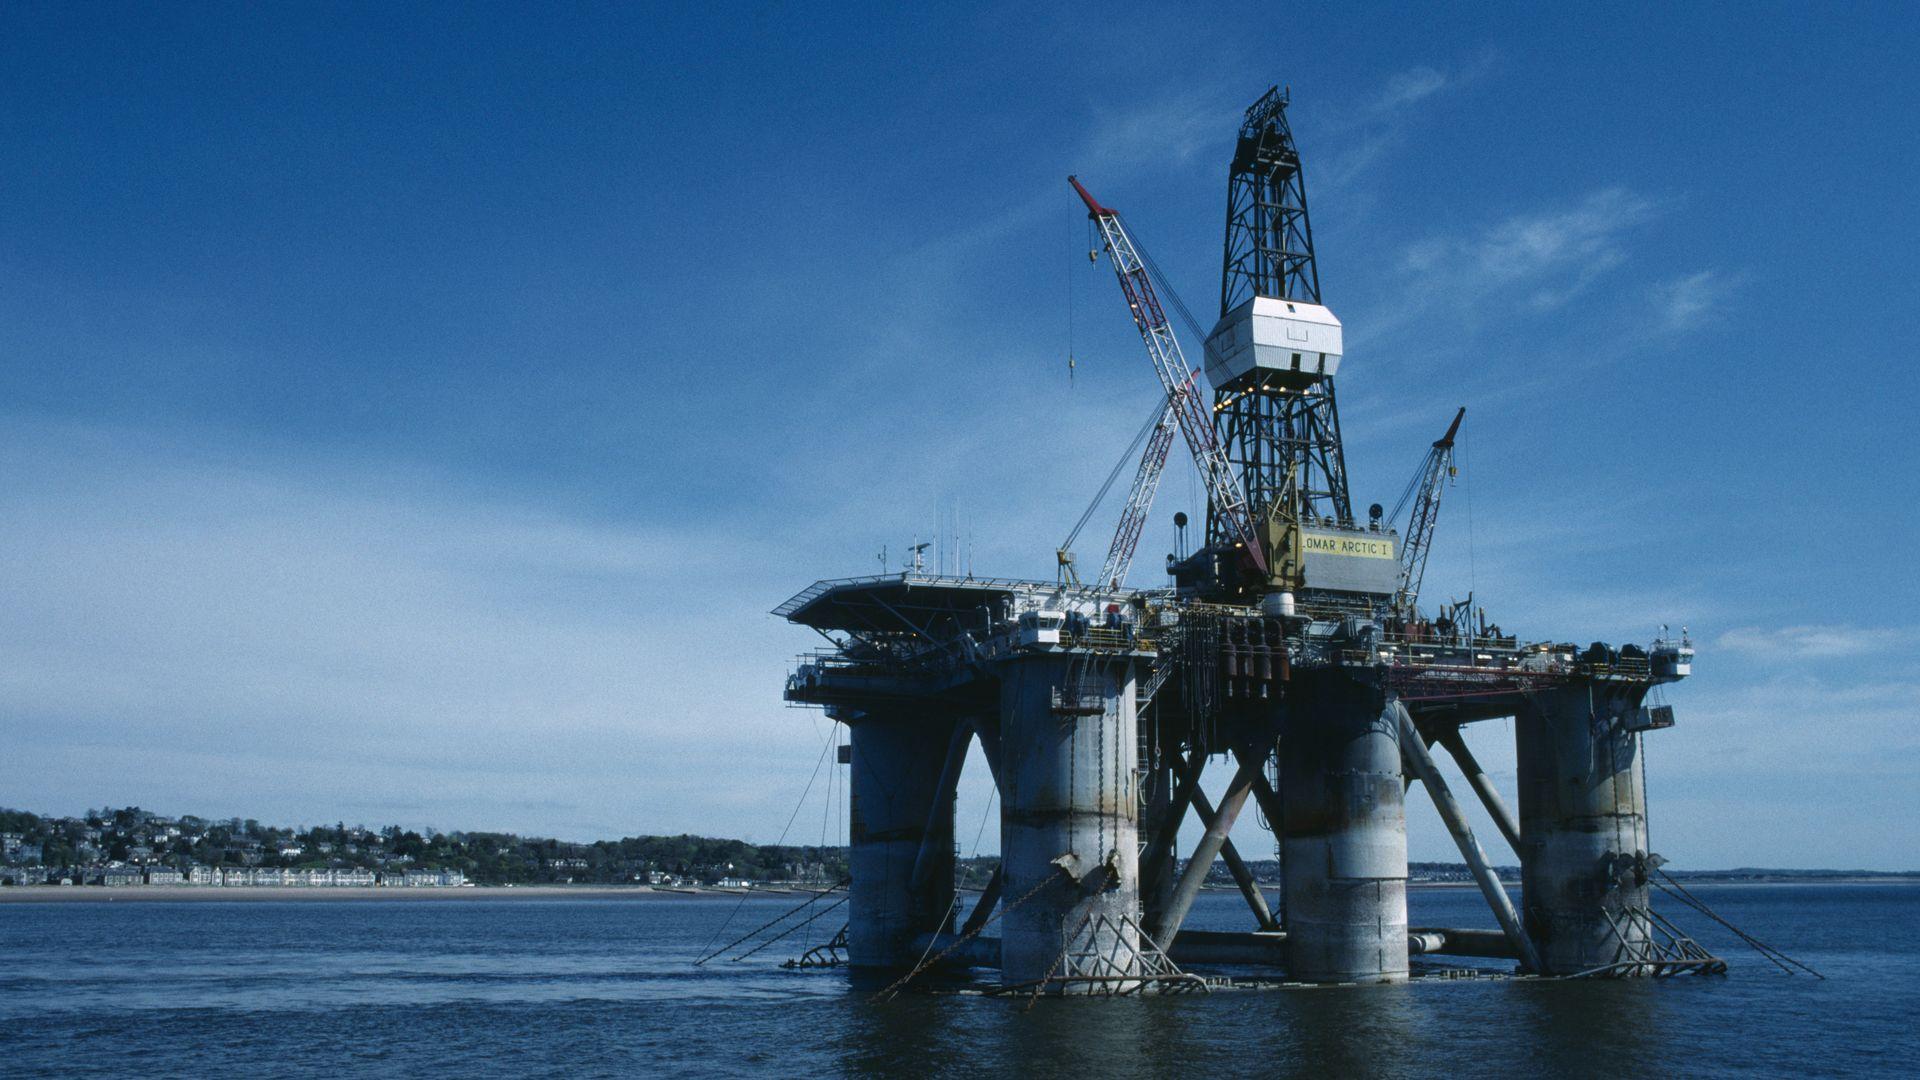 Semi Submersible Oil Rig